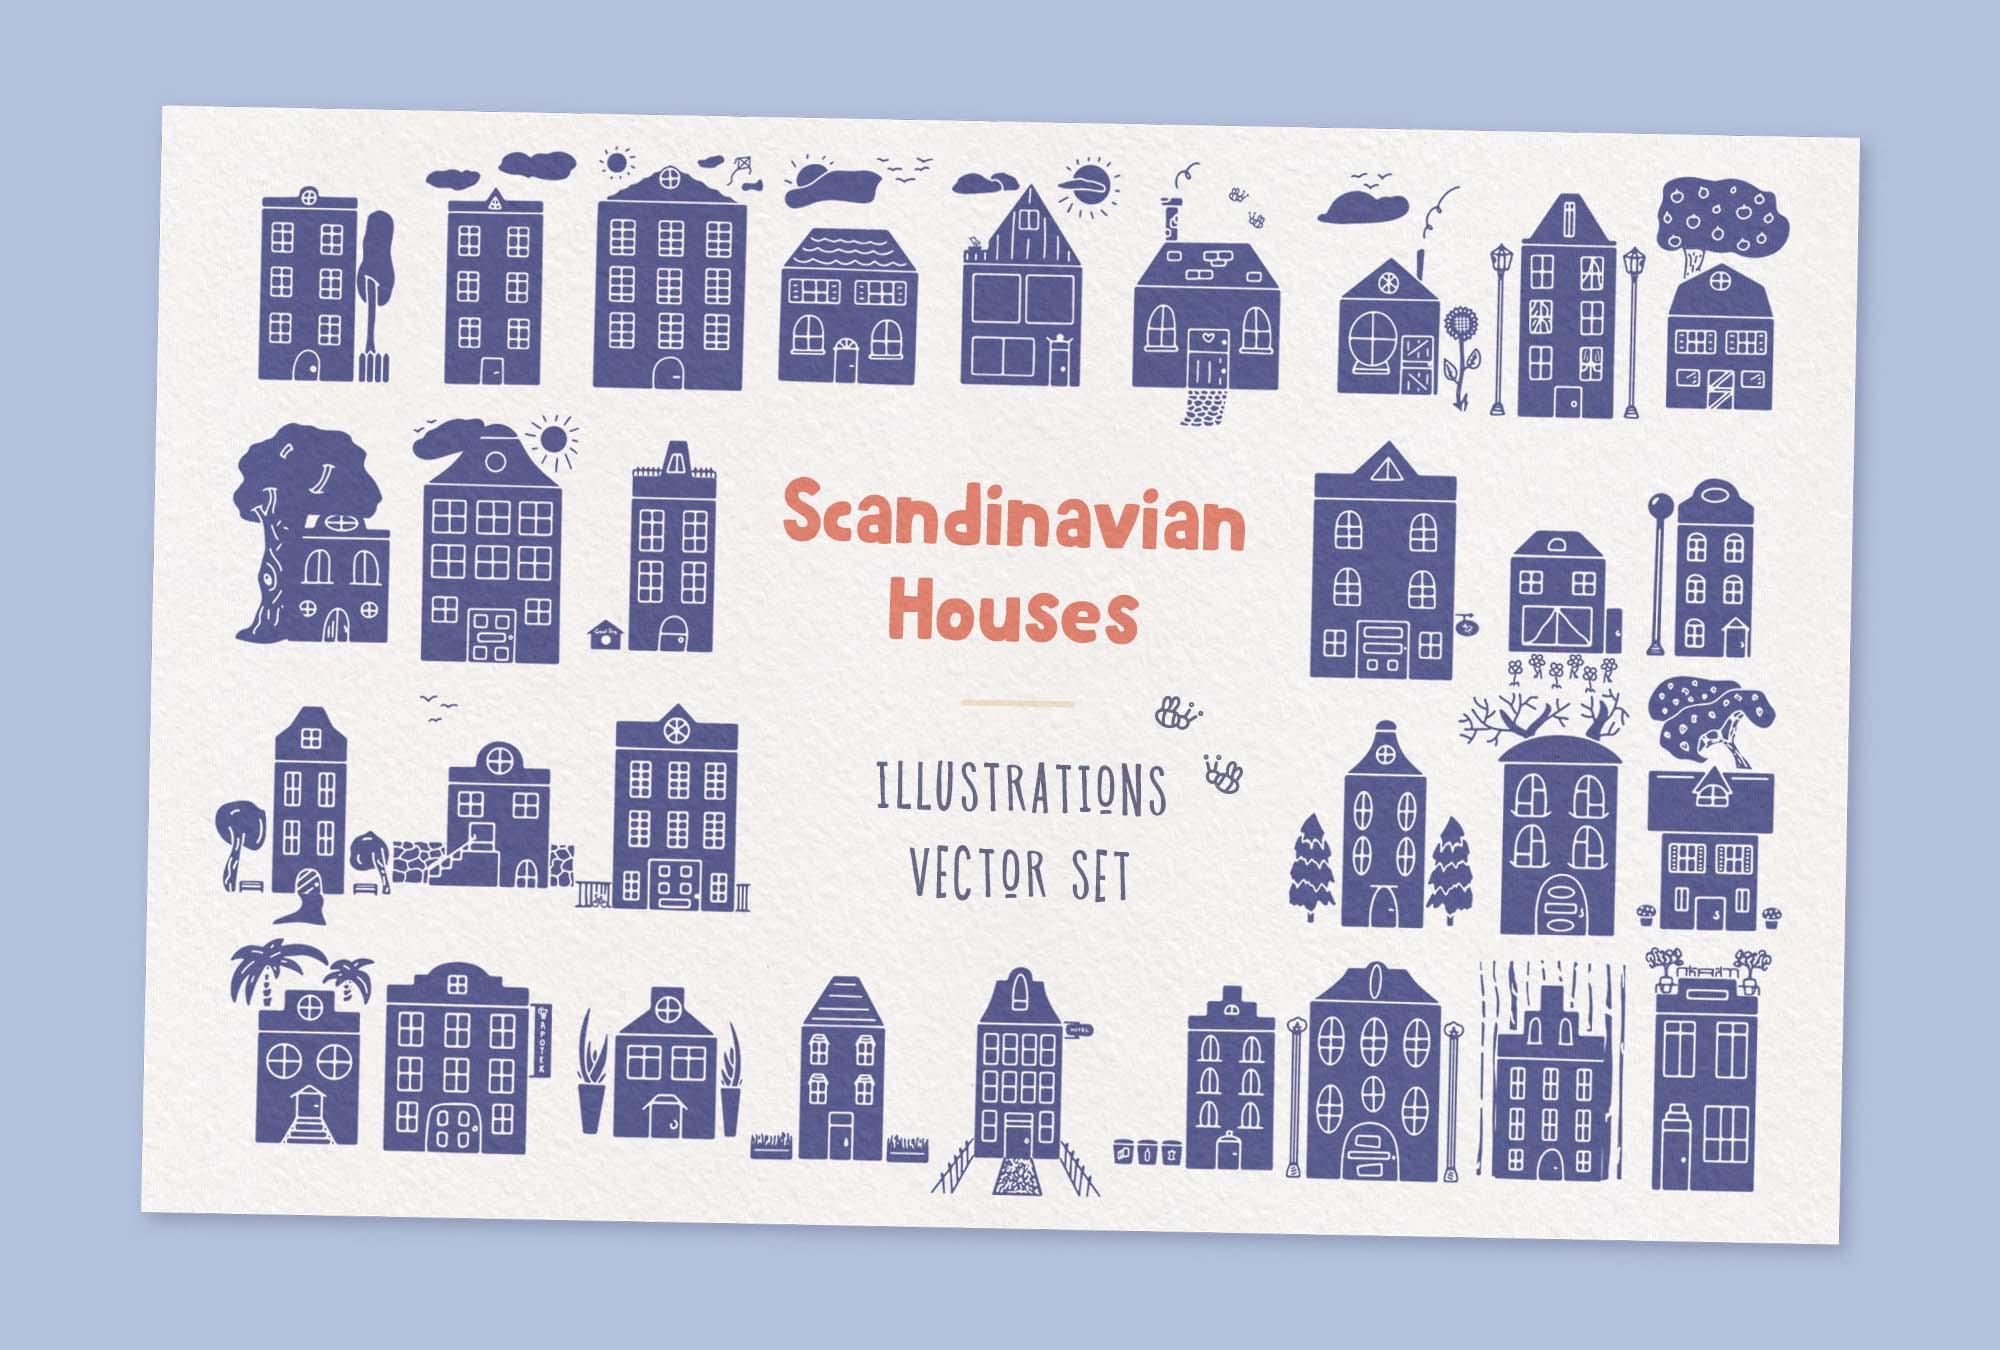 Scandinavian Houses Vector Illustrations 2